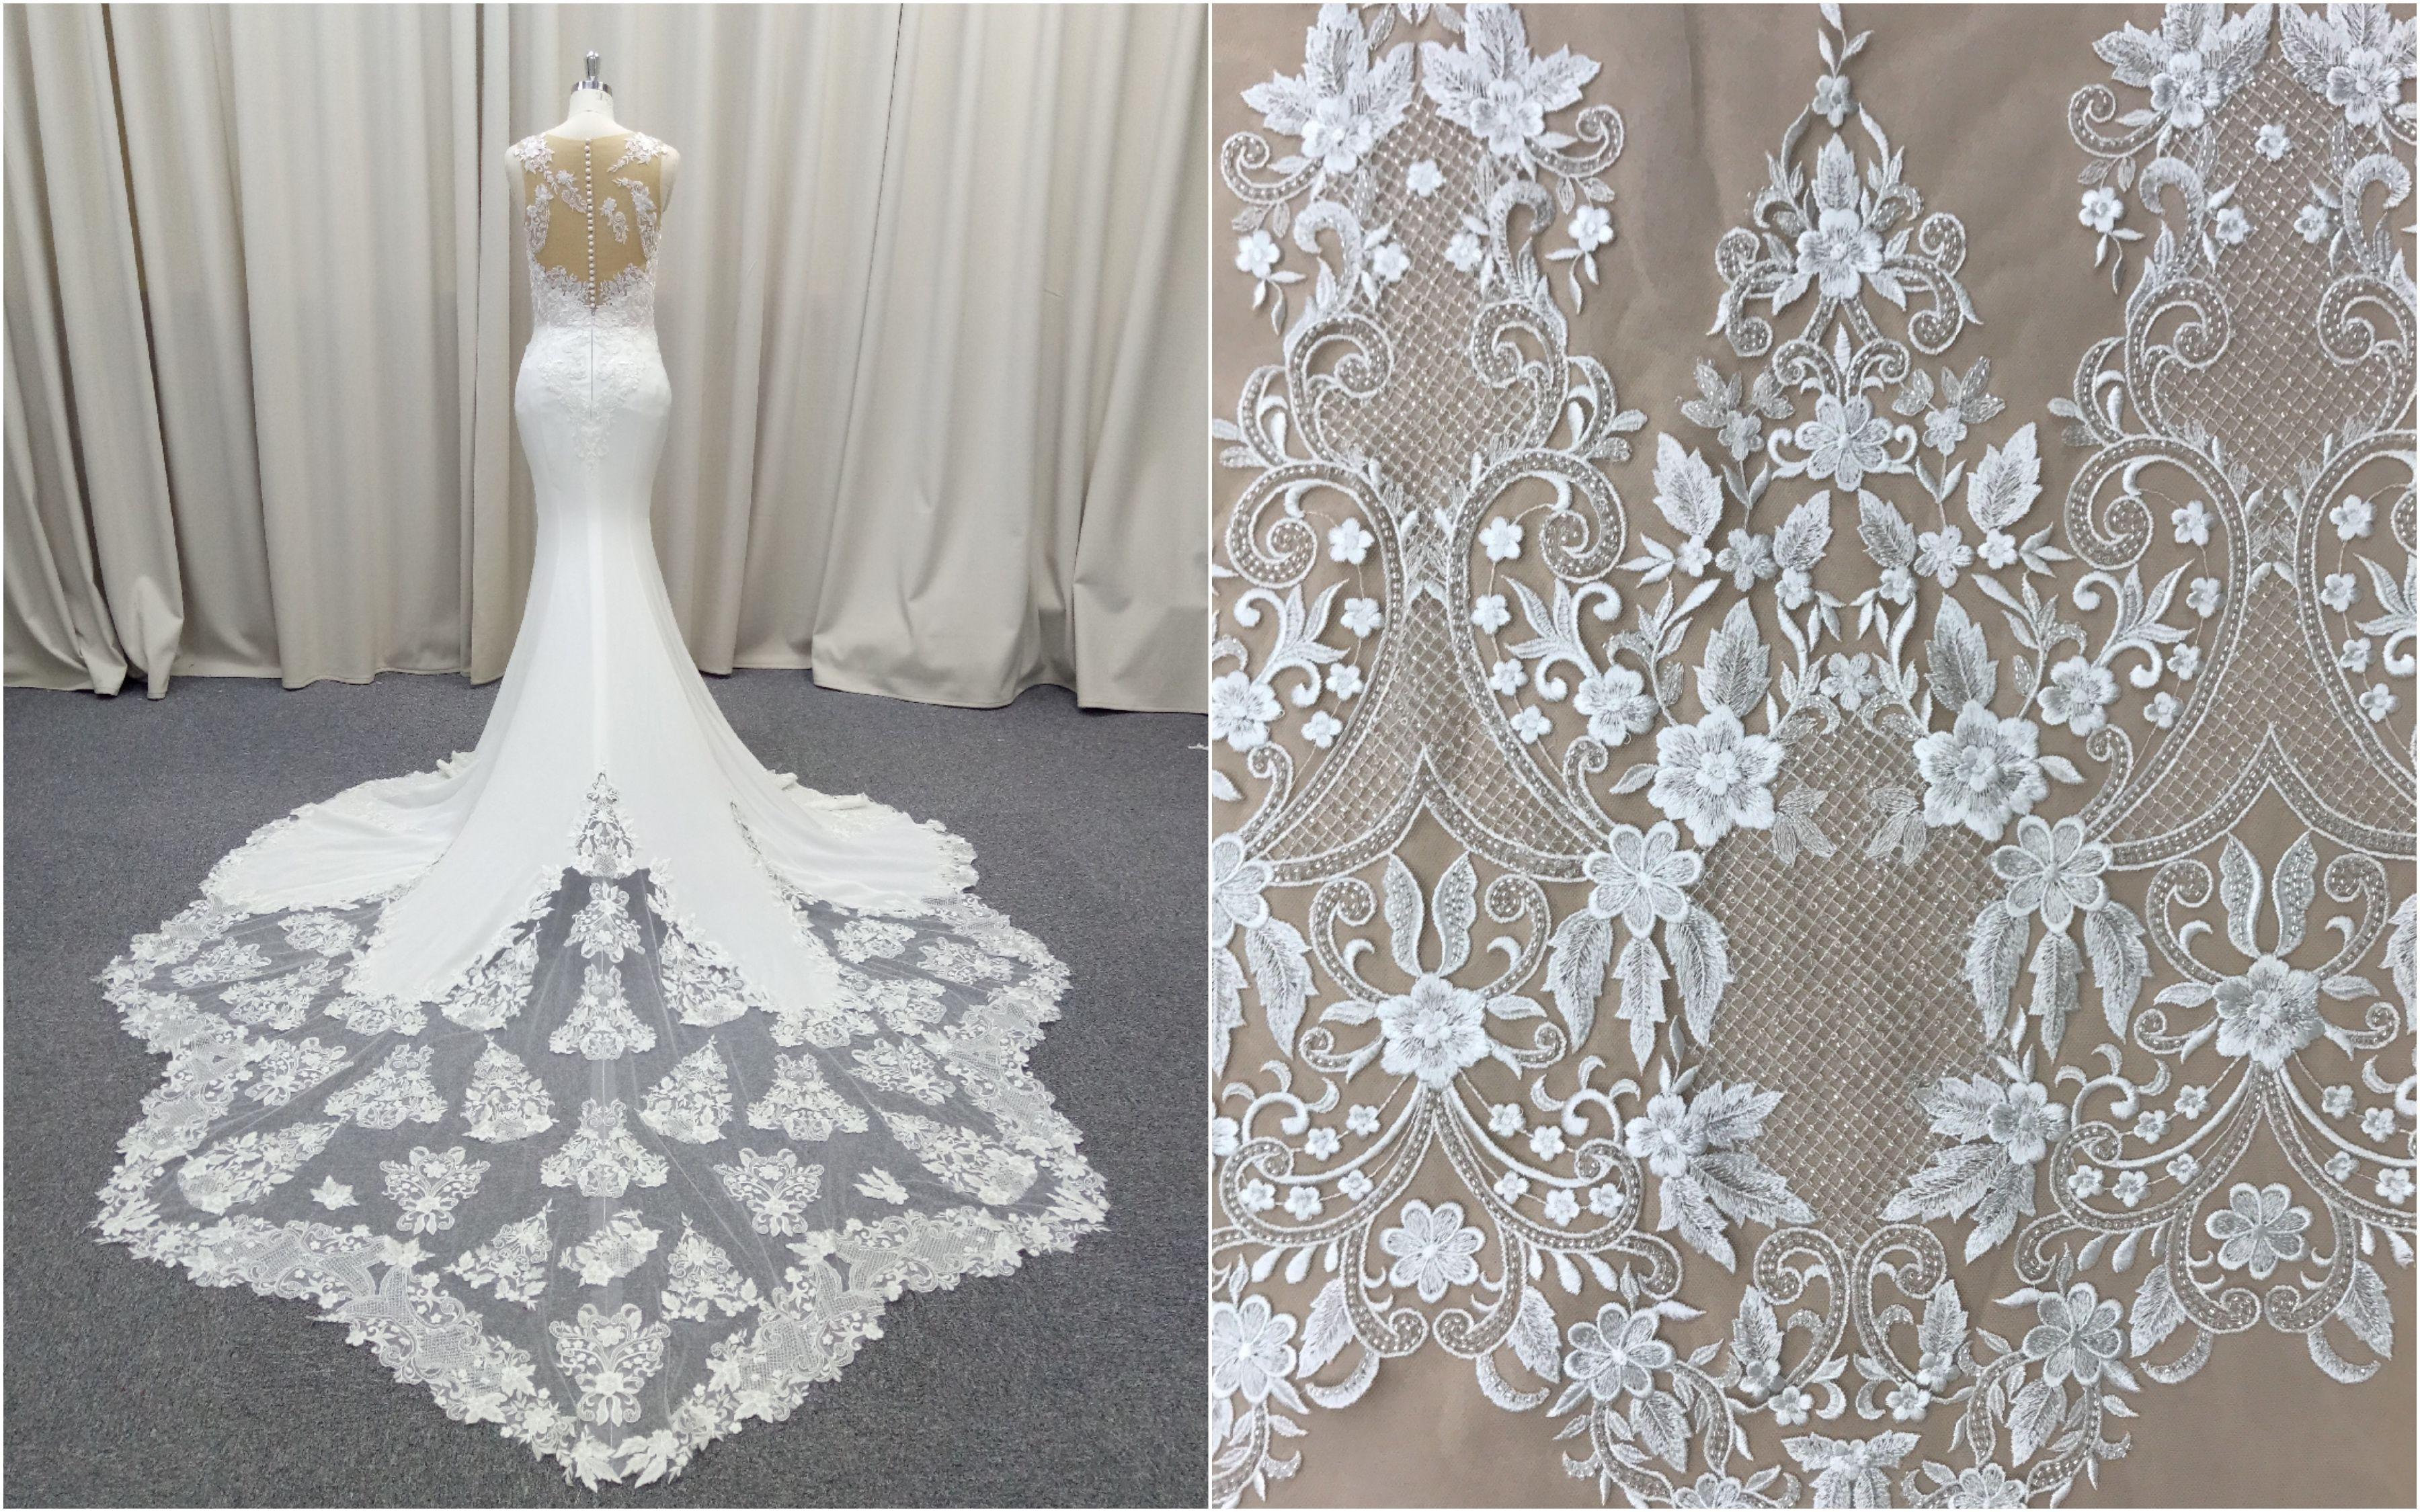 Dantelă Anomalie Decupaje Daphne Jpg Lace Cutout Wedding Dresses Lace Beaded Wedding Gowns,Soft Pink Wedding Dresses